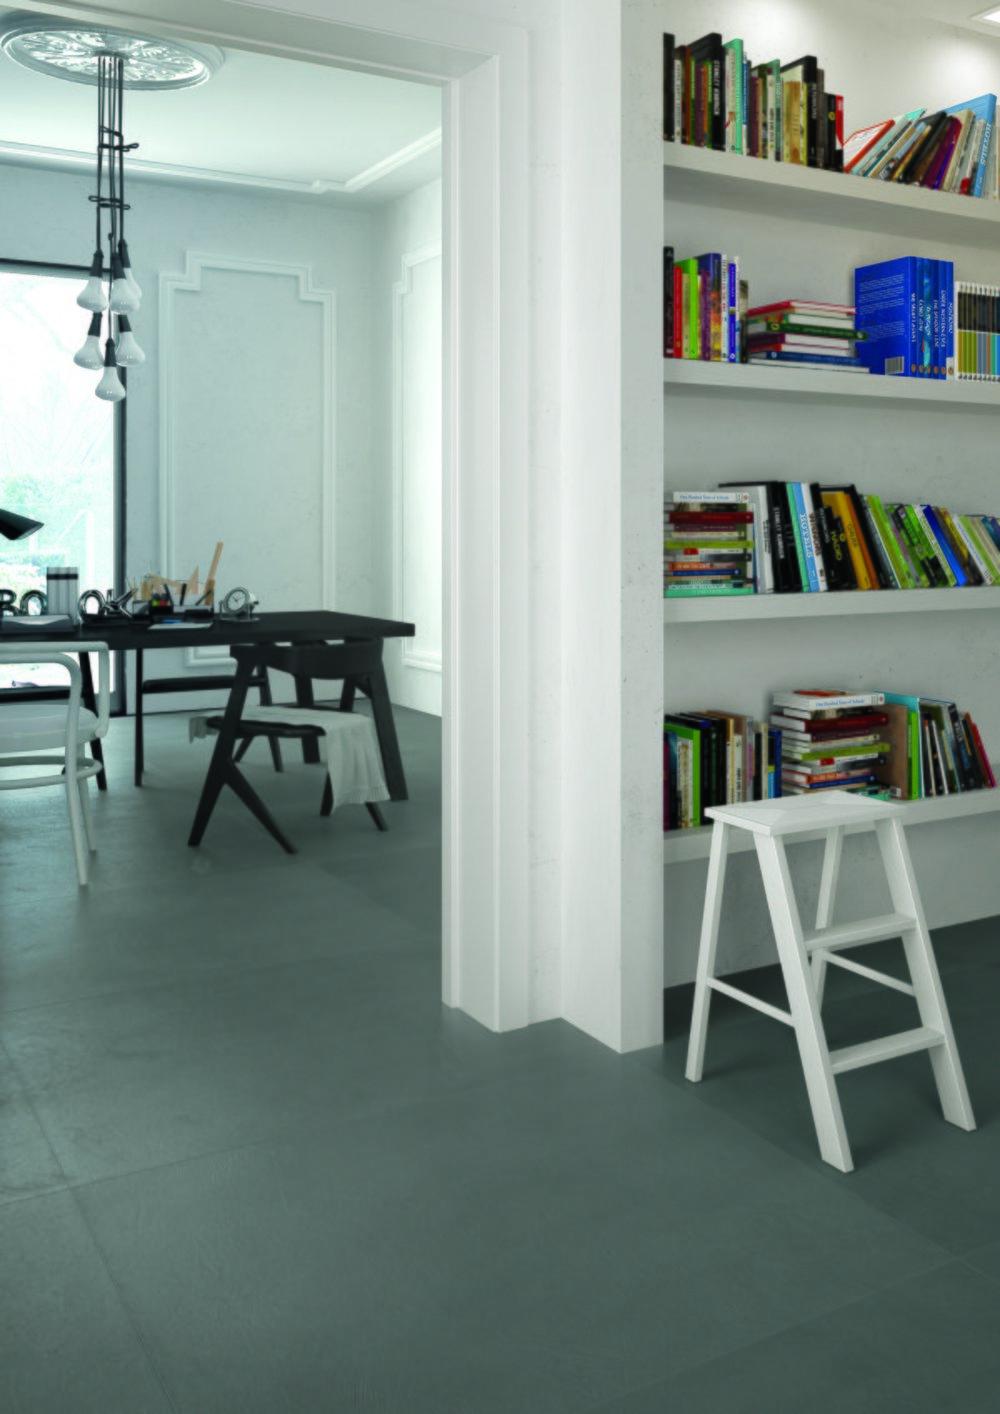 ir_ha_plumb_amb1_100100_living_libreria.jpg